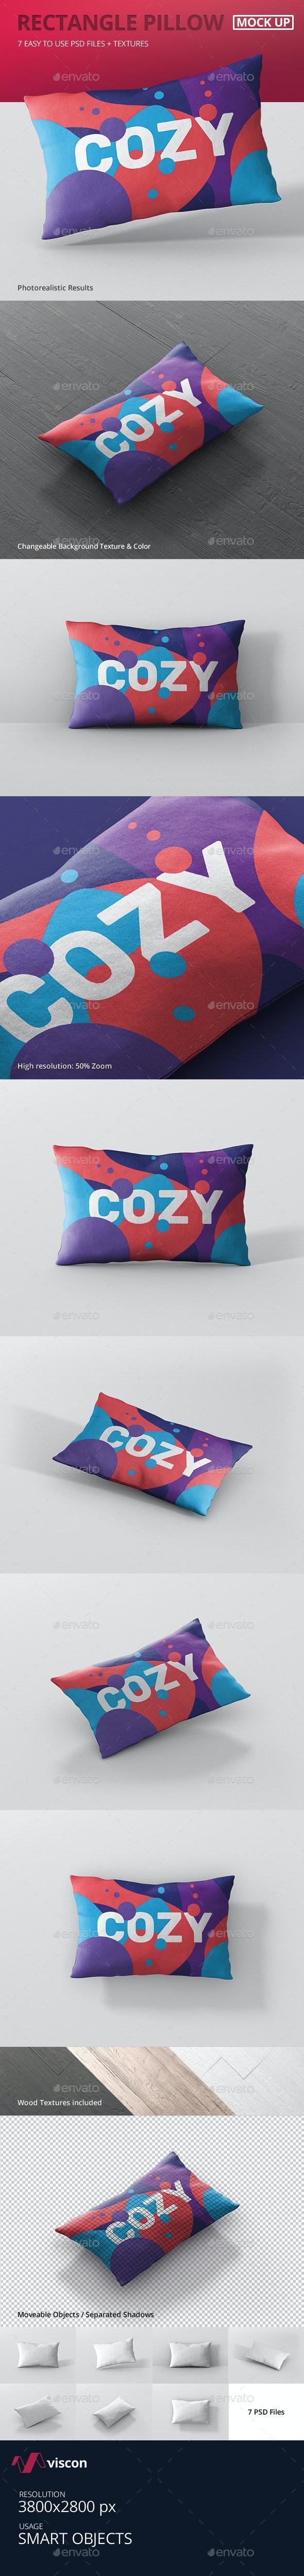 Pillow Mockup - Rectangle - Miscellaneous Product Mock-Ups